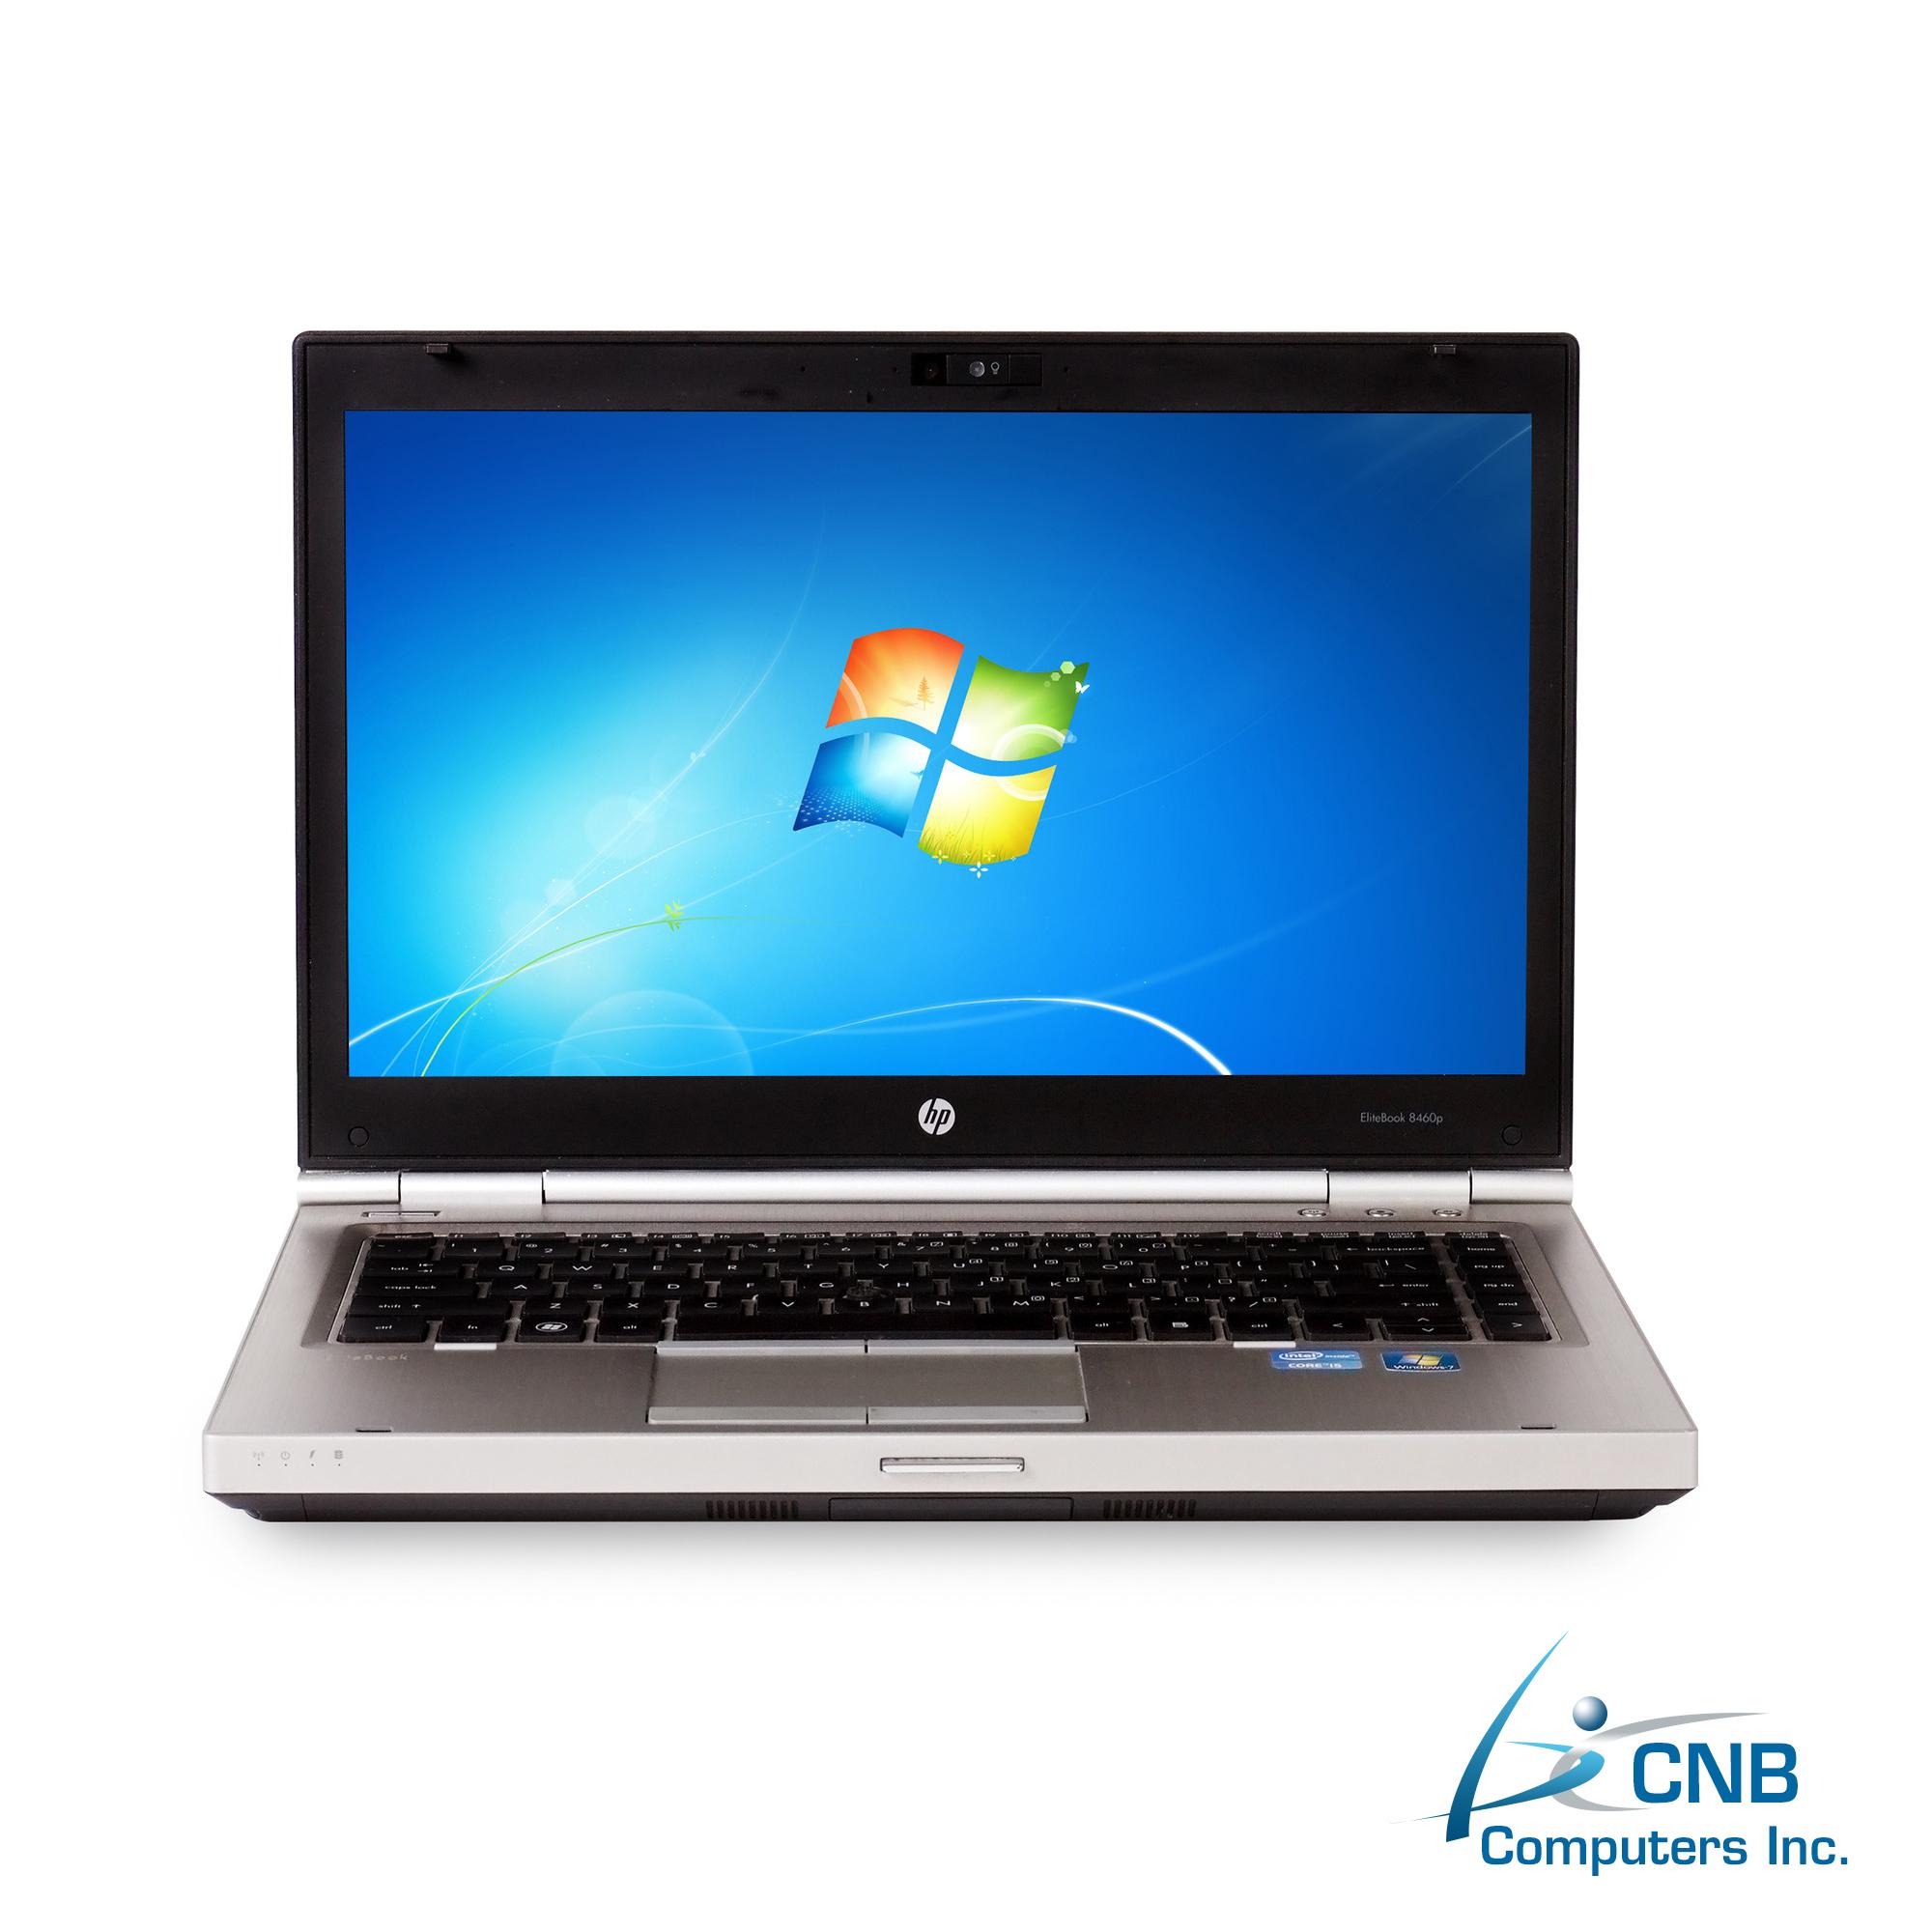 HP ELITEBOOK 8460P LAPTOP, 4GB, 250GB HDD, INTEL i5 2520M 2 5GHz | CNB